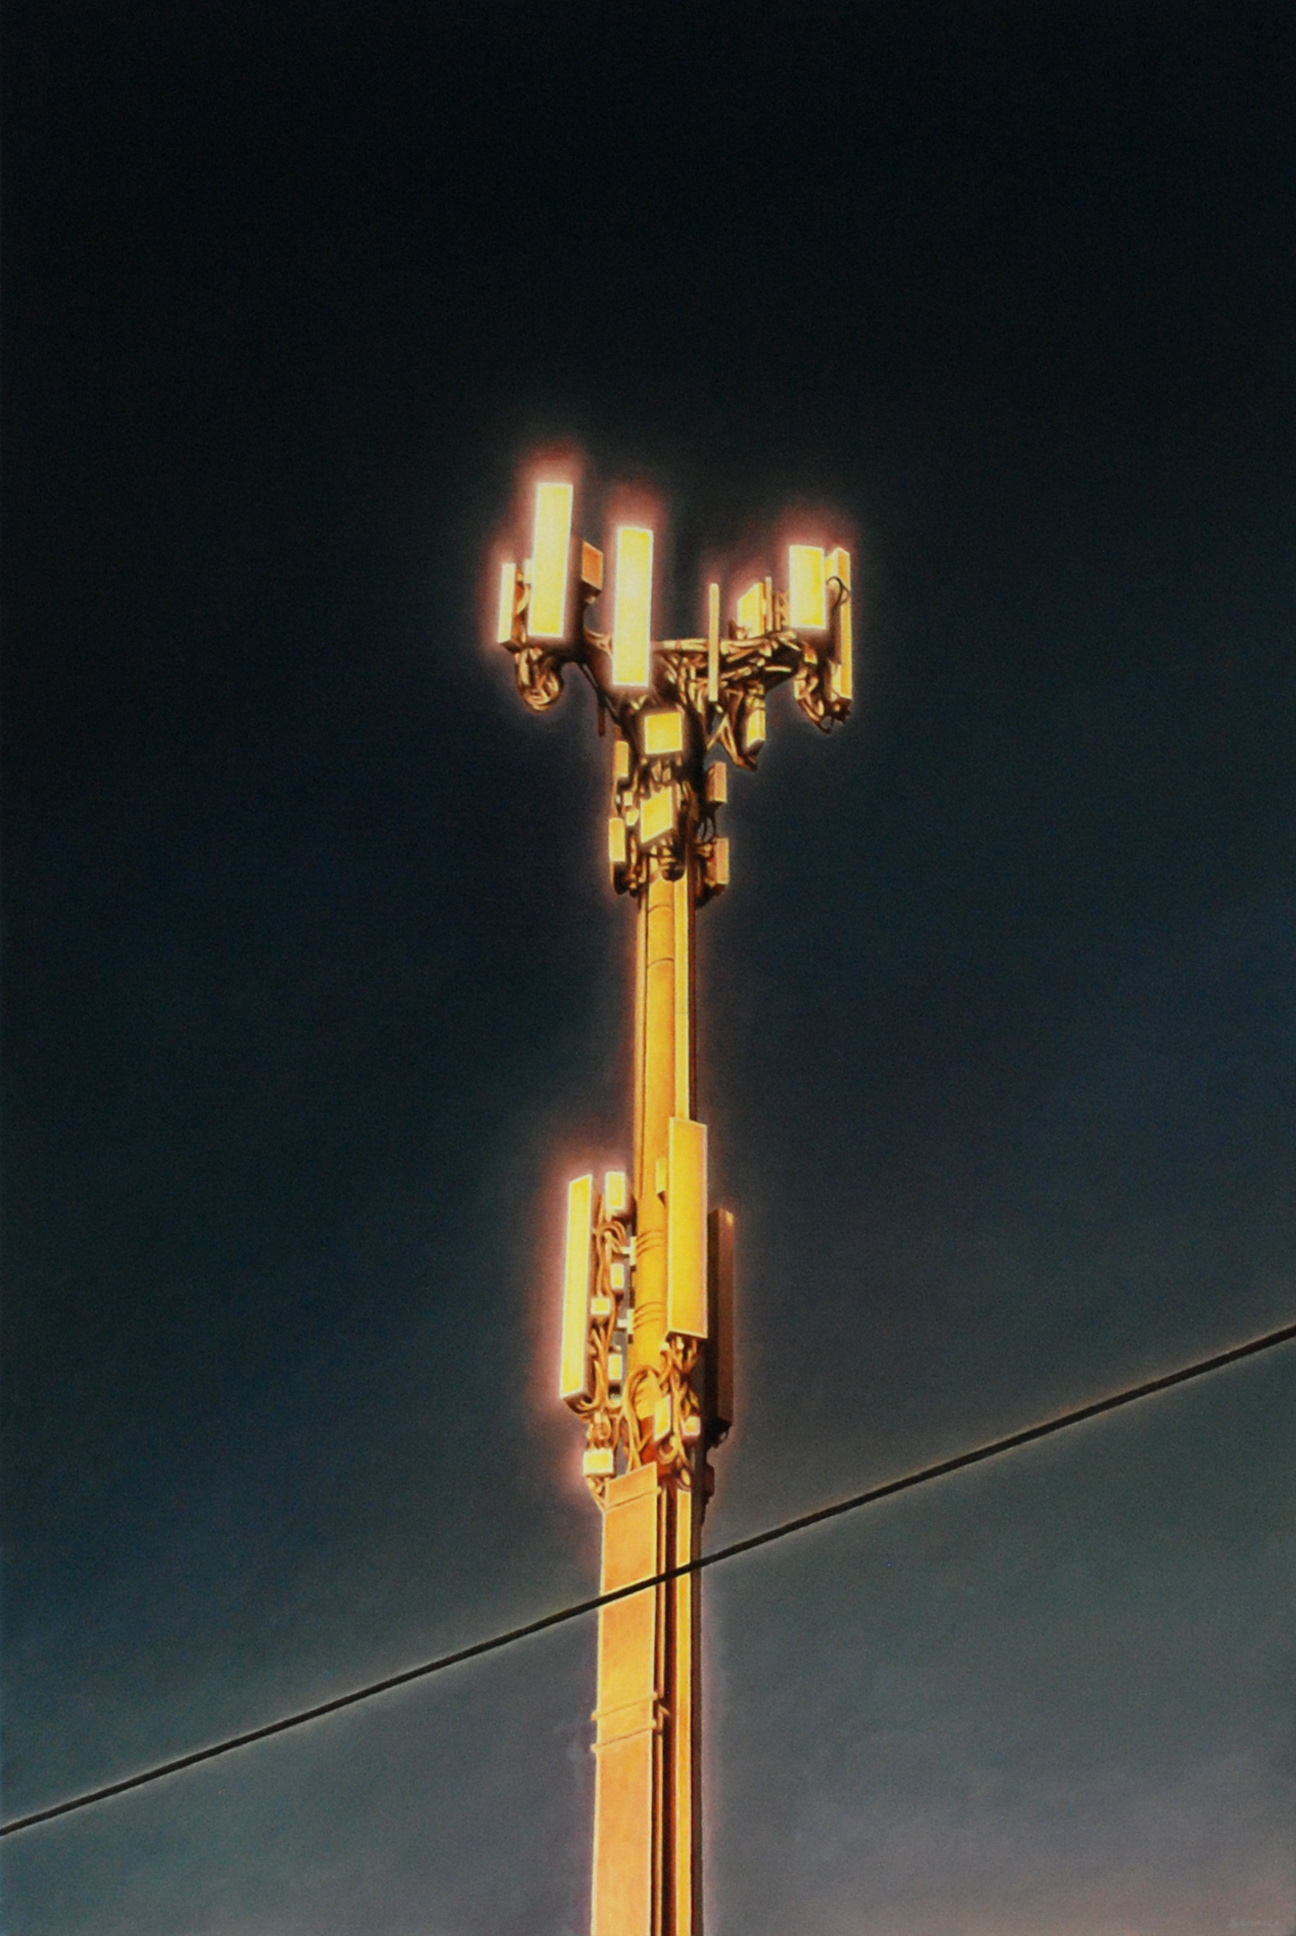 James Bonnici 'Tower 2' oil on linen, 41 x 61 cm, available